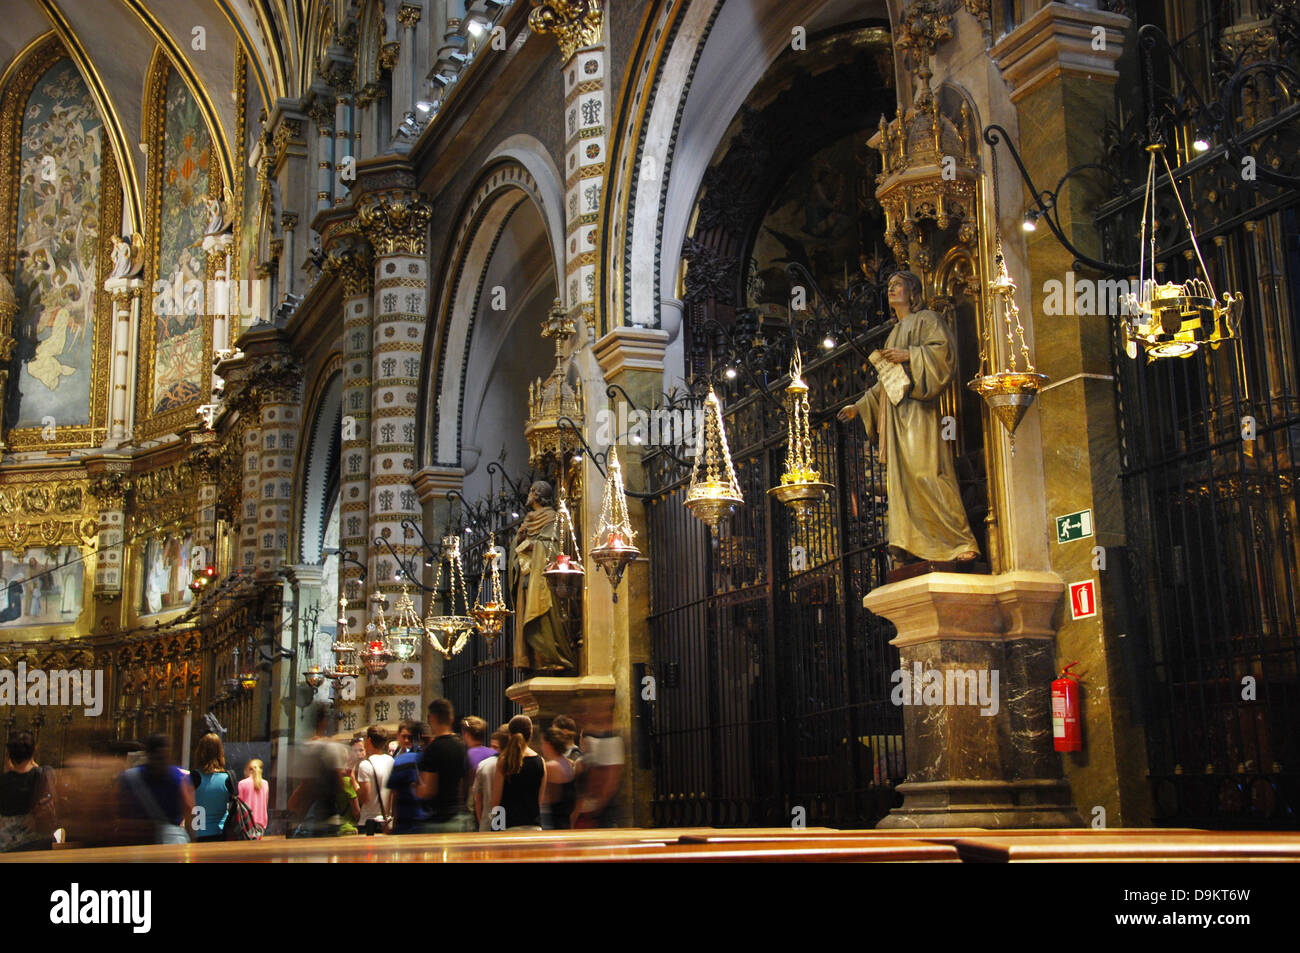 Monasterio de Montserrat, cerca de Barcelona, España Imagen De Stock